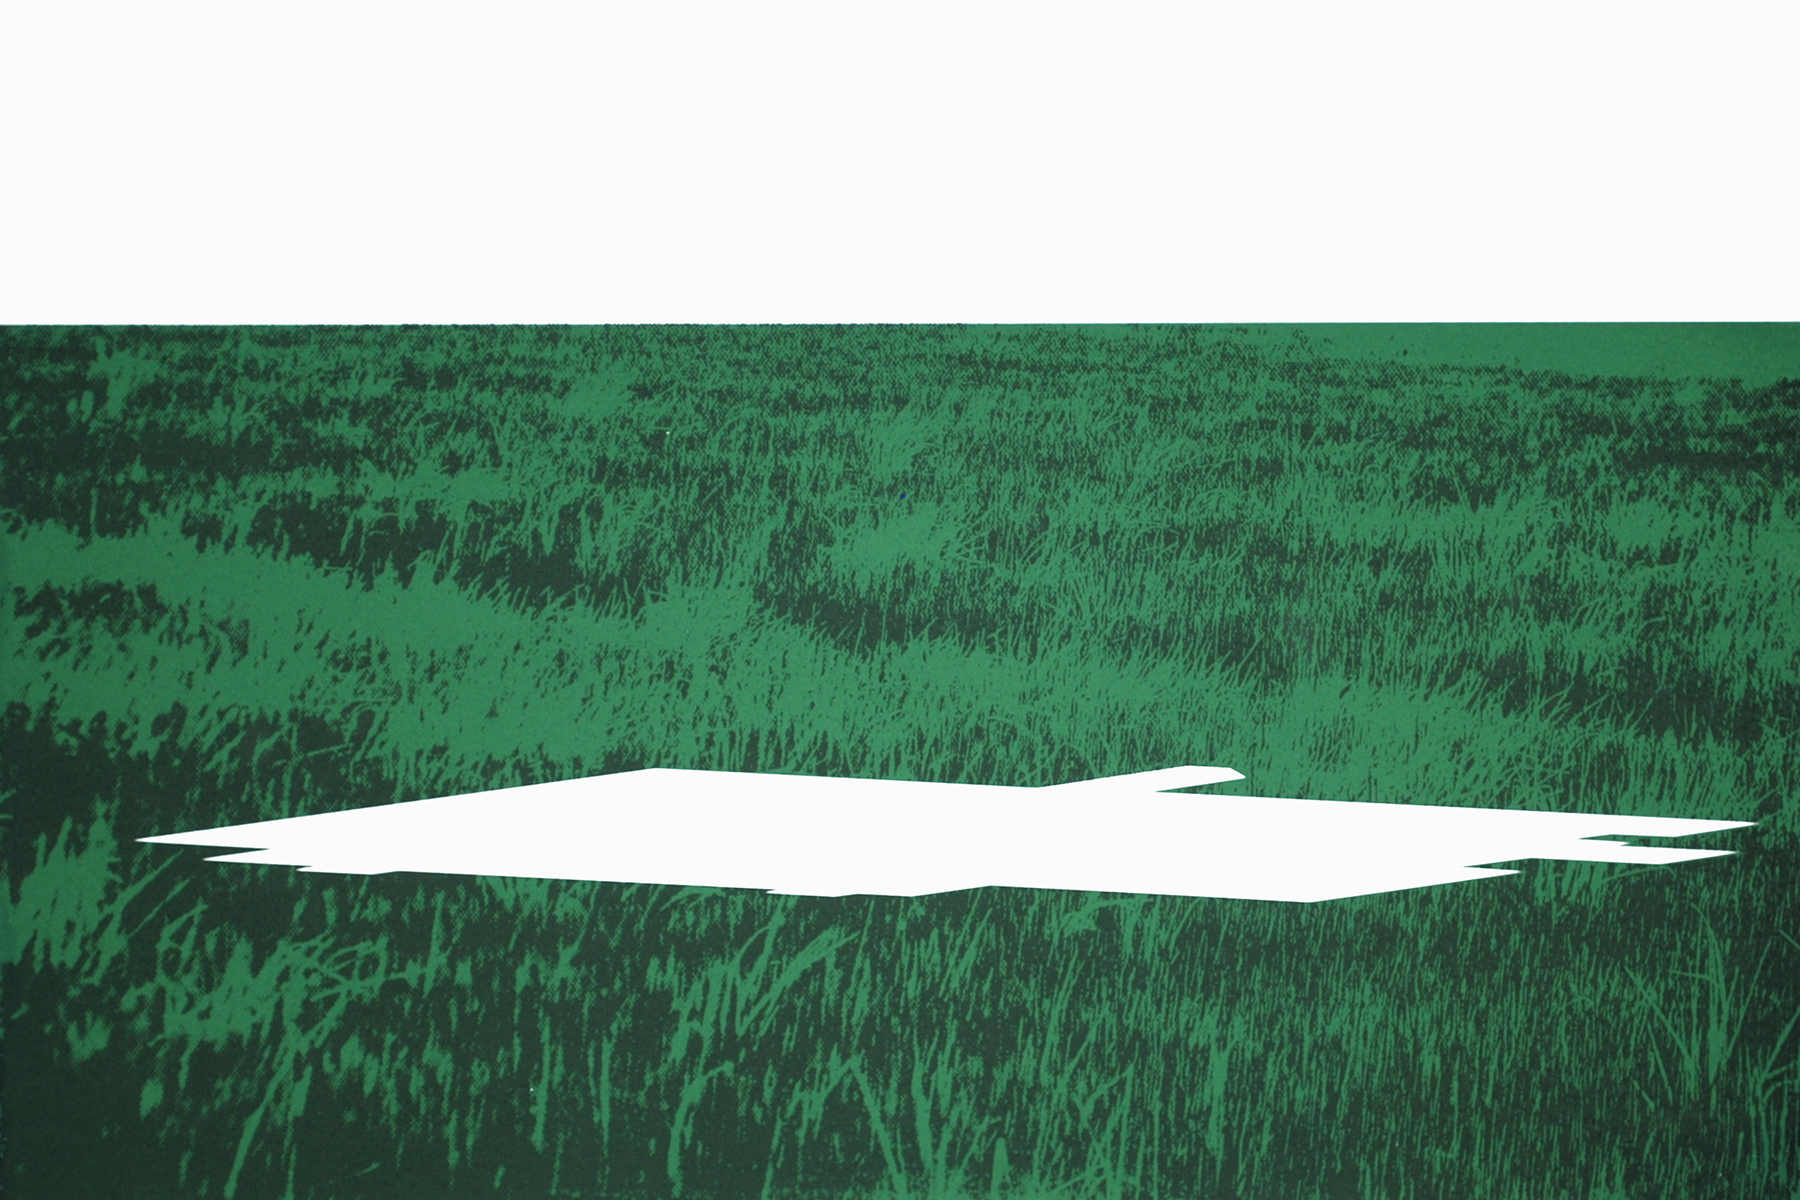 2010ComingSoon2_web.jpg